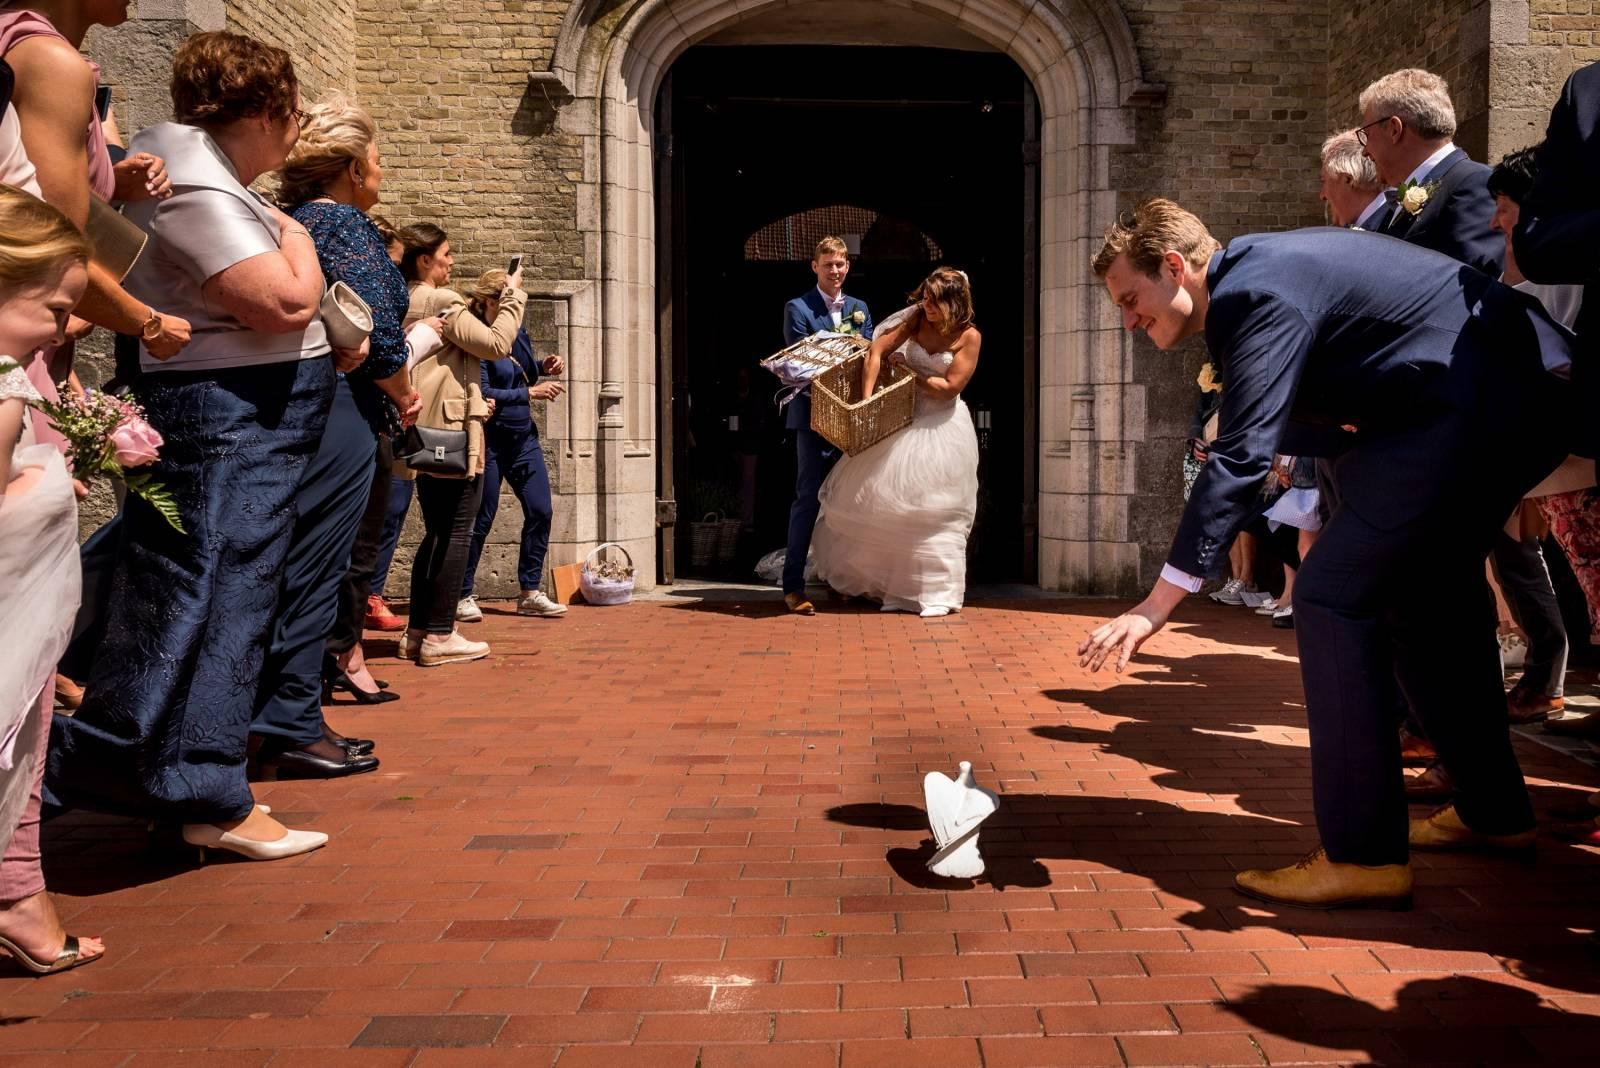 Fotografie Melody - Huwelijksfotograaf - Trouwfotograaf - House of Weddings - 13